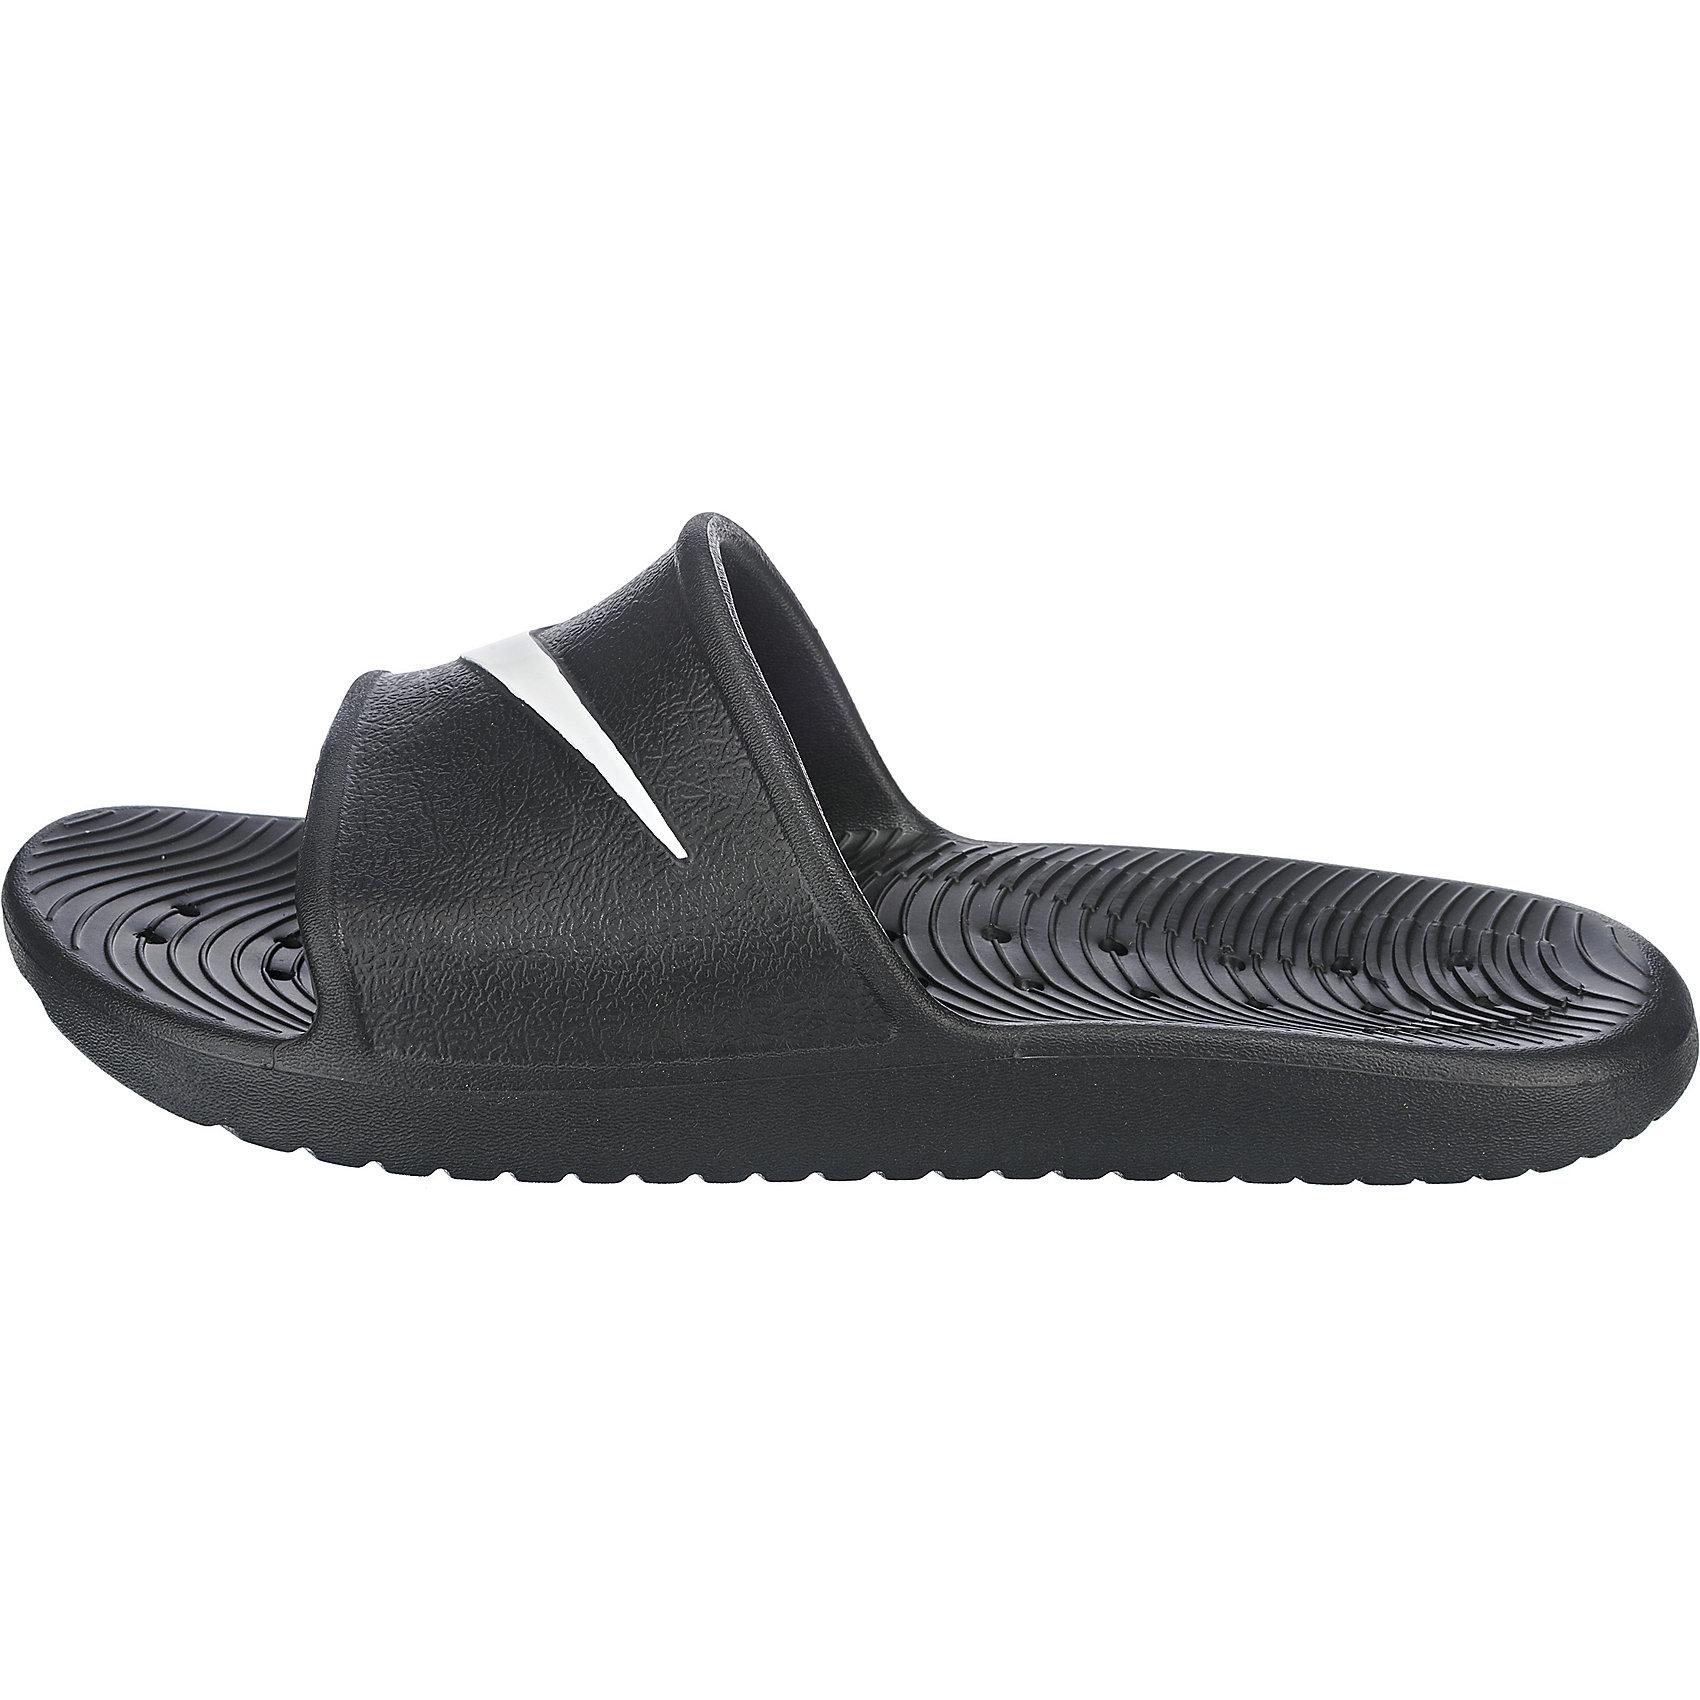 Details Zu Herren Shower Nike Schuhe Neu Sportswear Kawa Offene Für 5773103 osCtxhQBrd